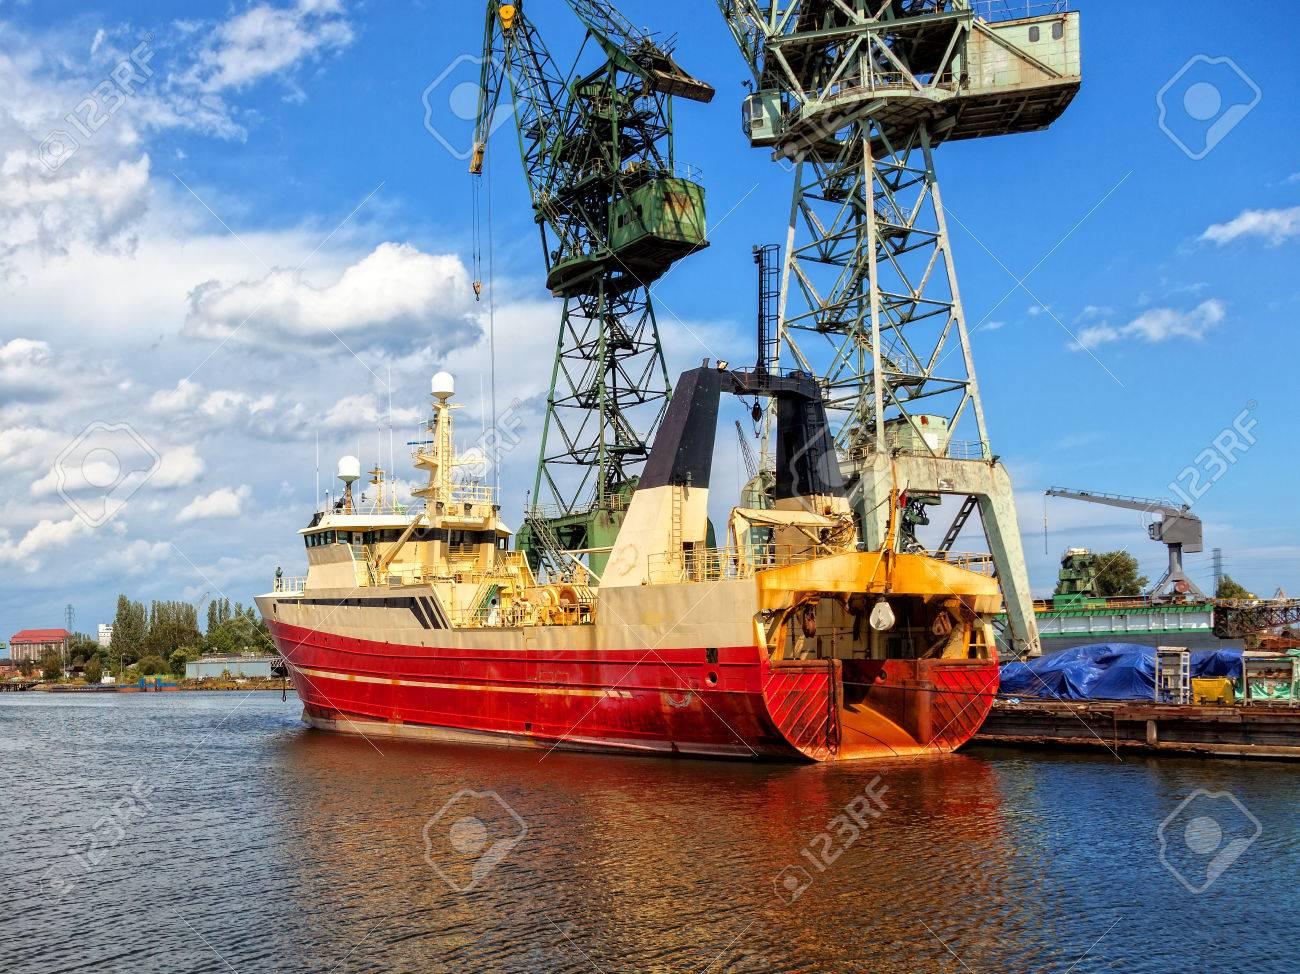 Fishing vessel trawler in a repair yard Stock Photo - 26275544